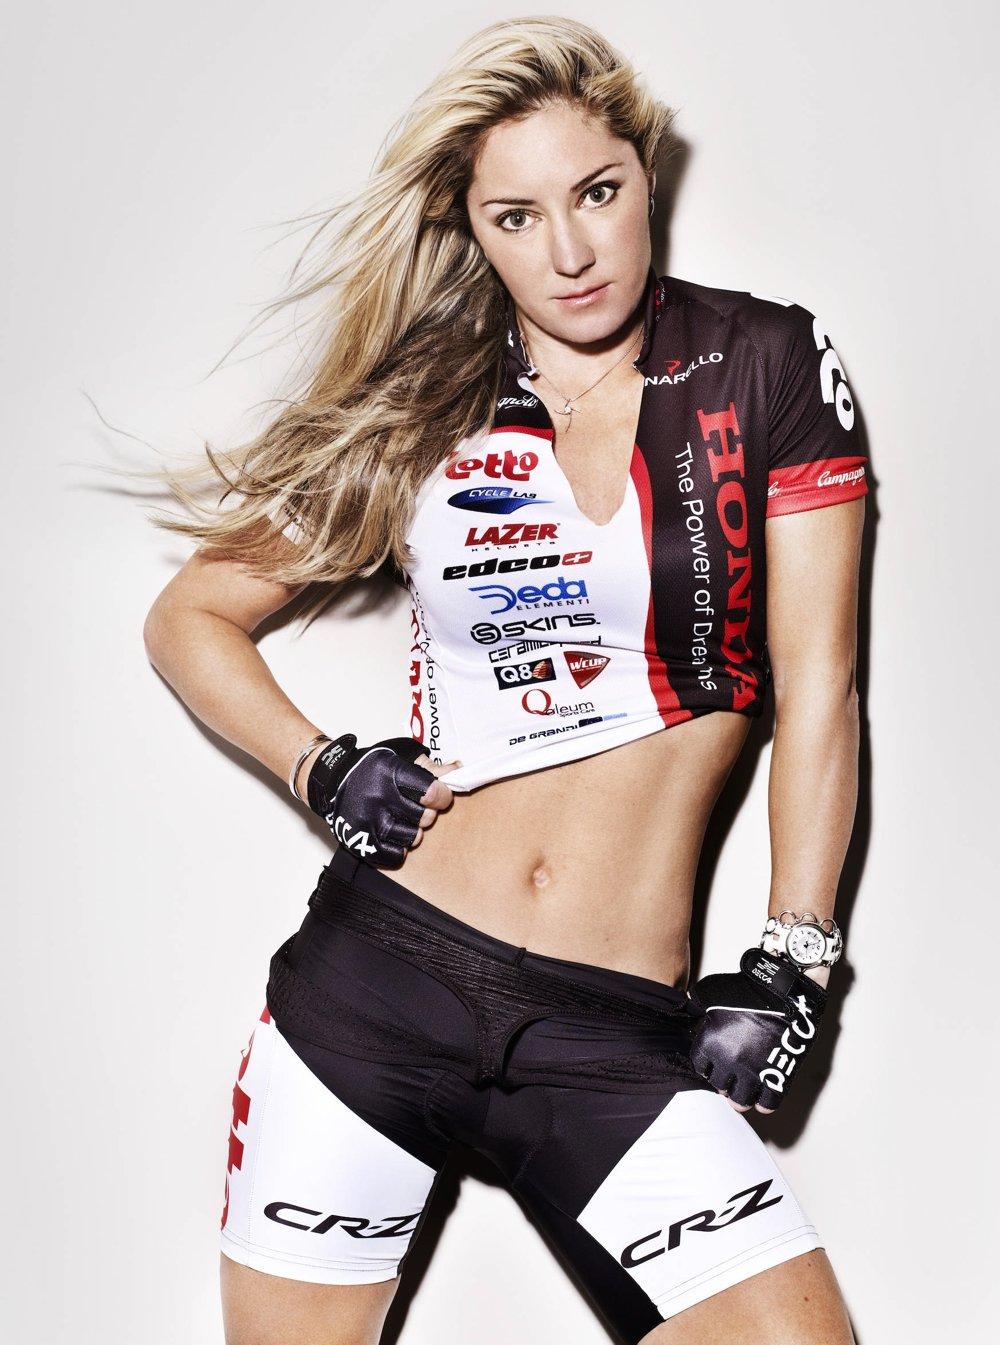 Rochelle Gilmore (3)